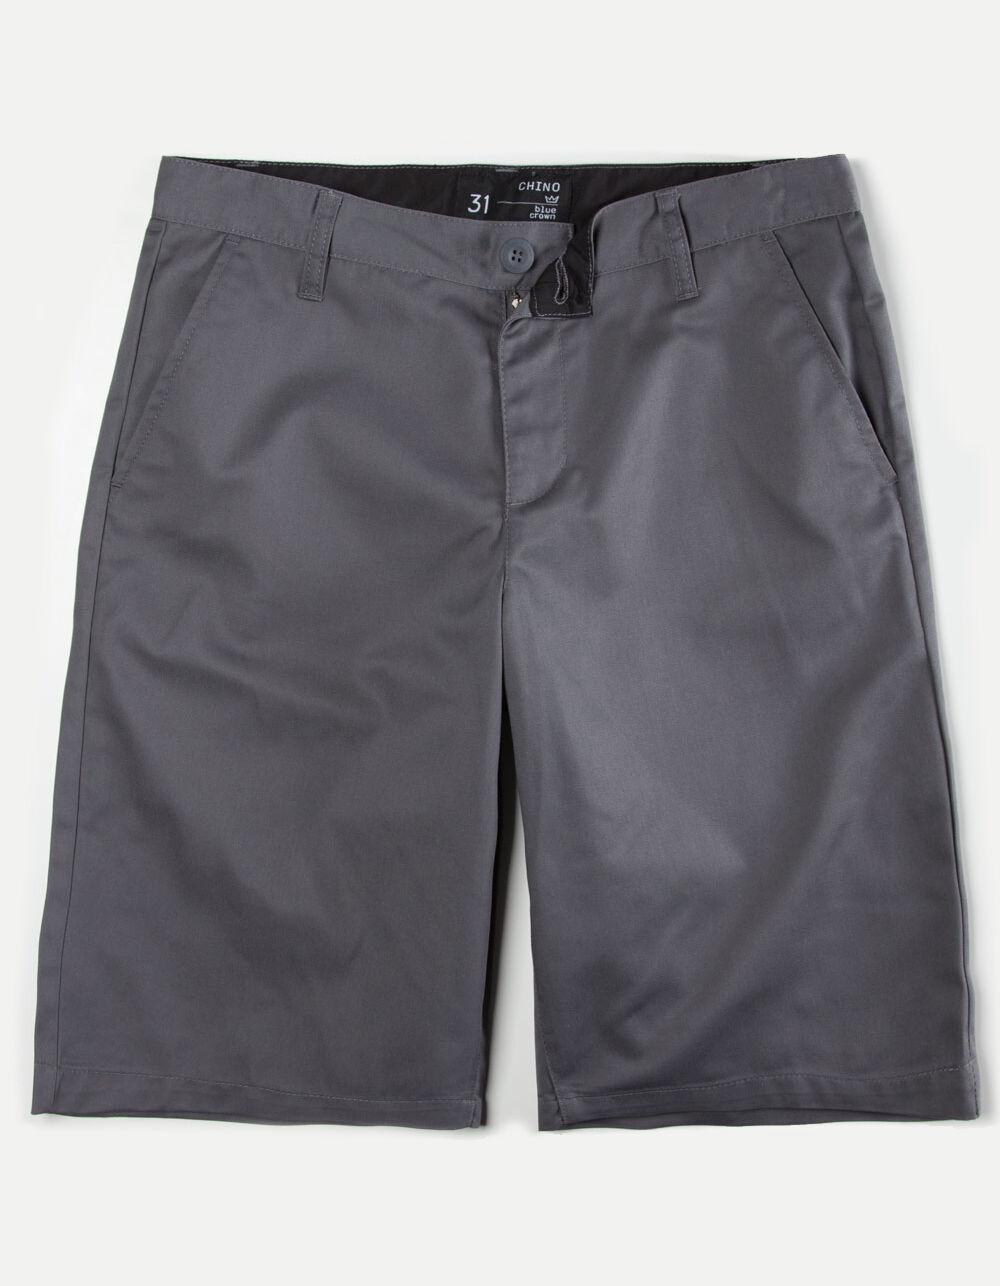 BLUE CROWN Classic Mens Chino Shorts